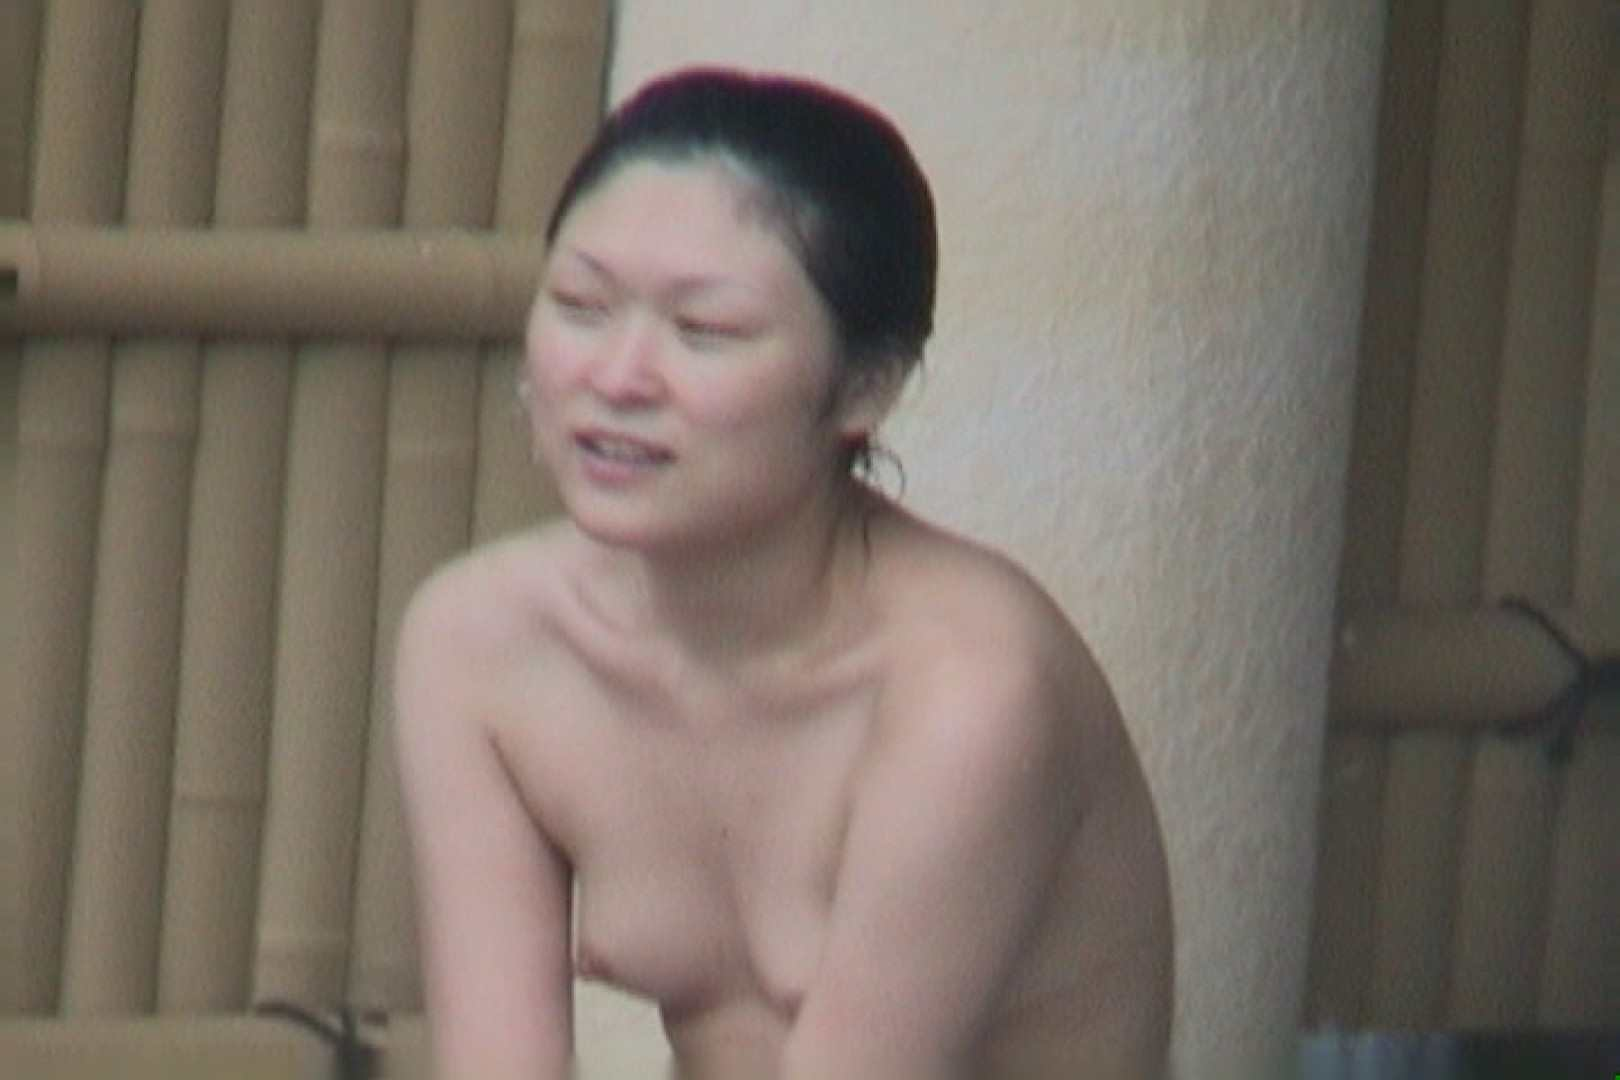 Aquaな露天風呂Vol.601 エッチな盗撮 アダルト動画キャプチャ 99pic 78